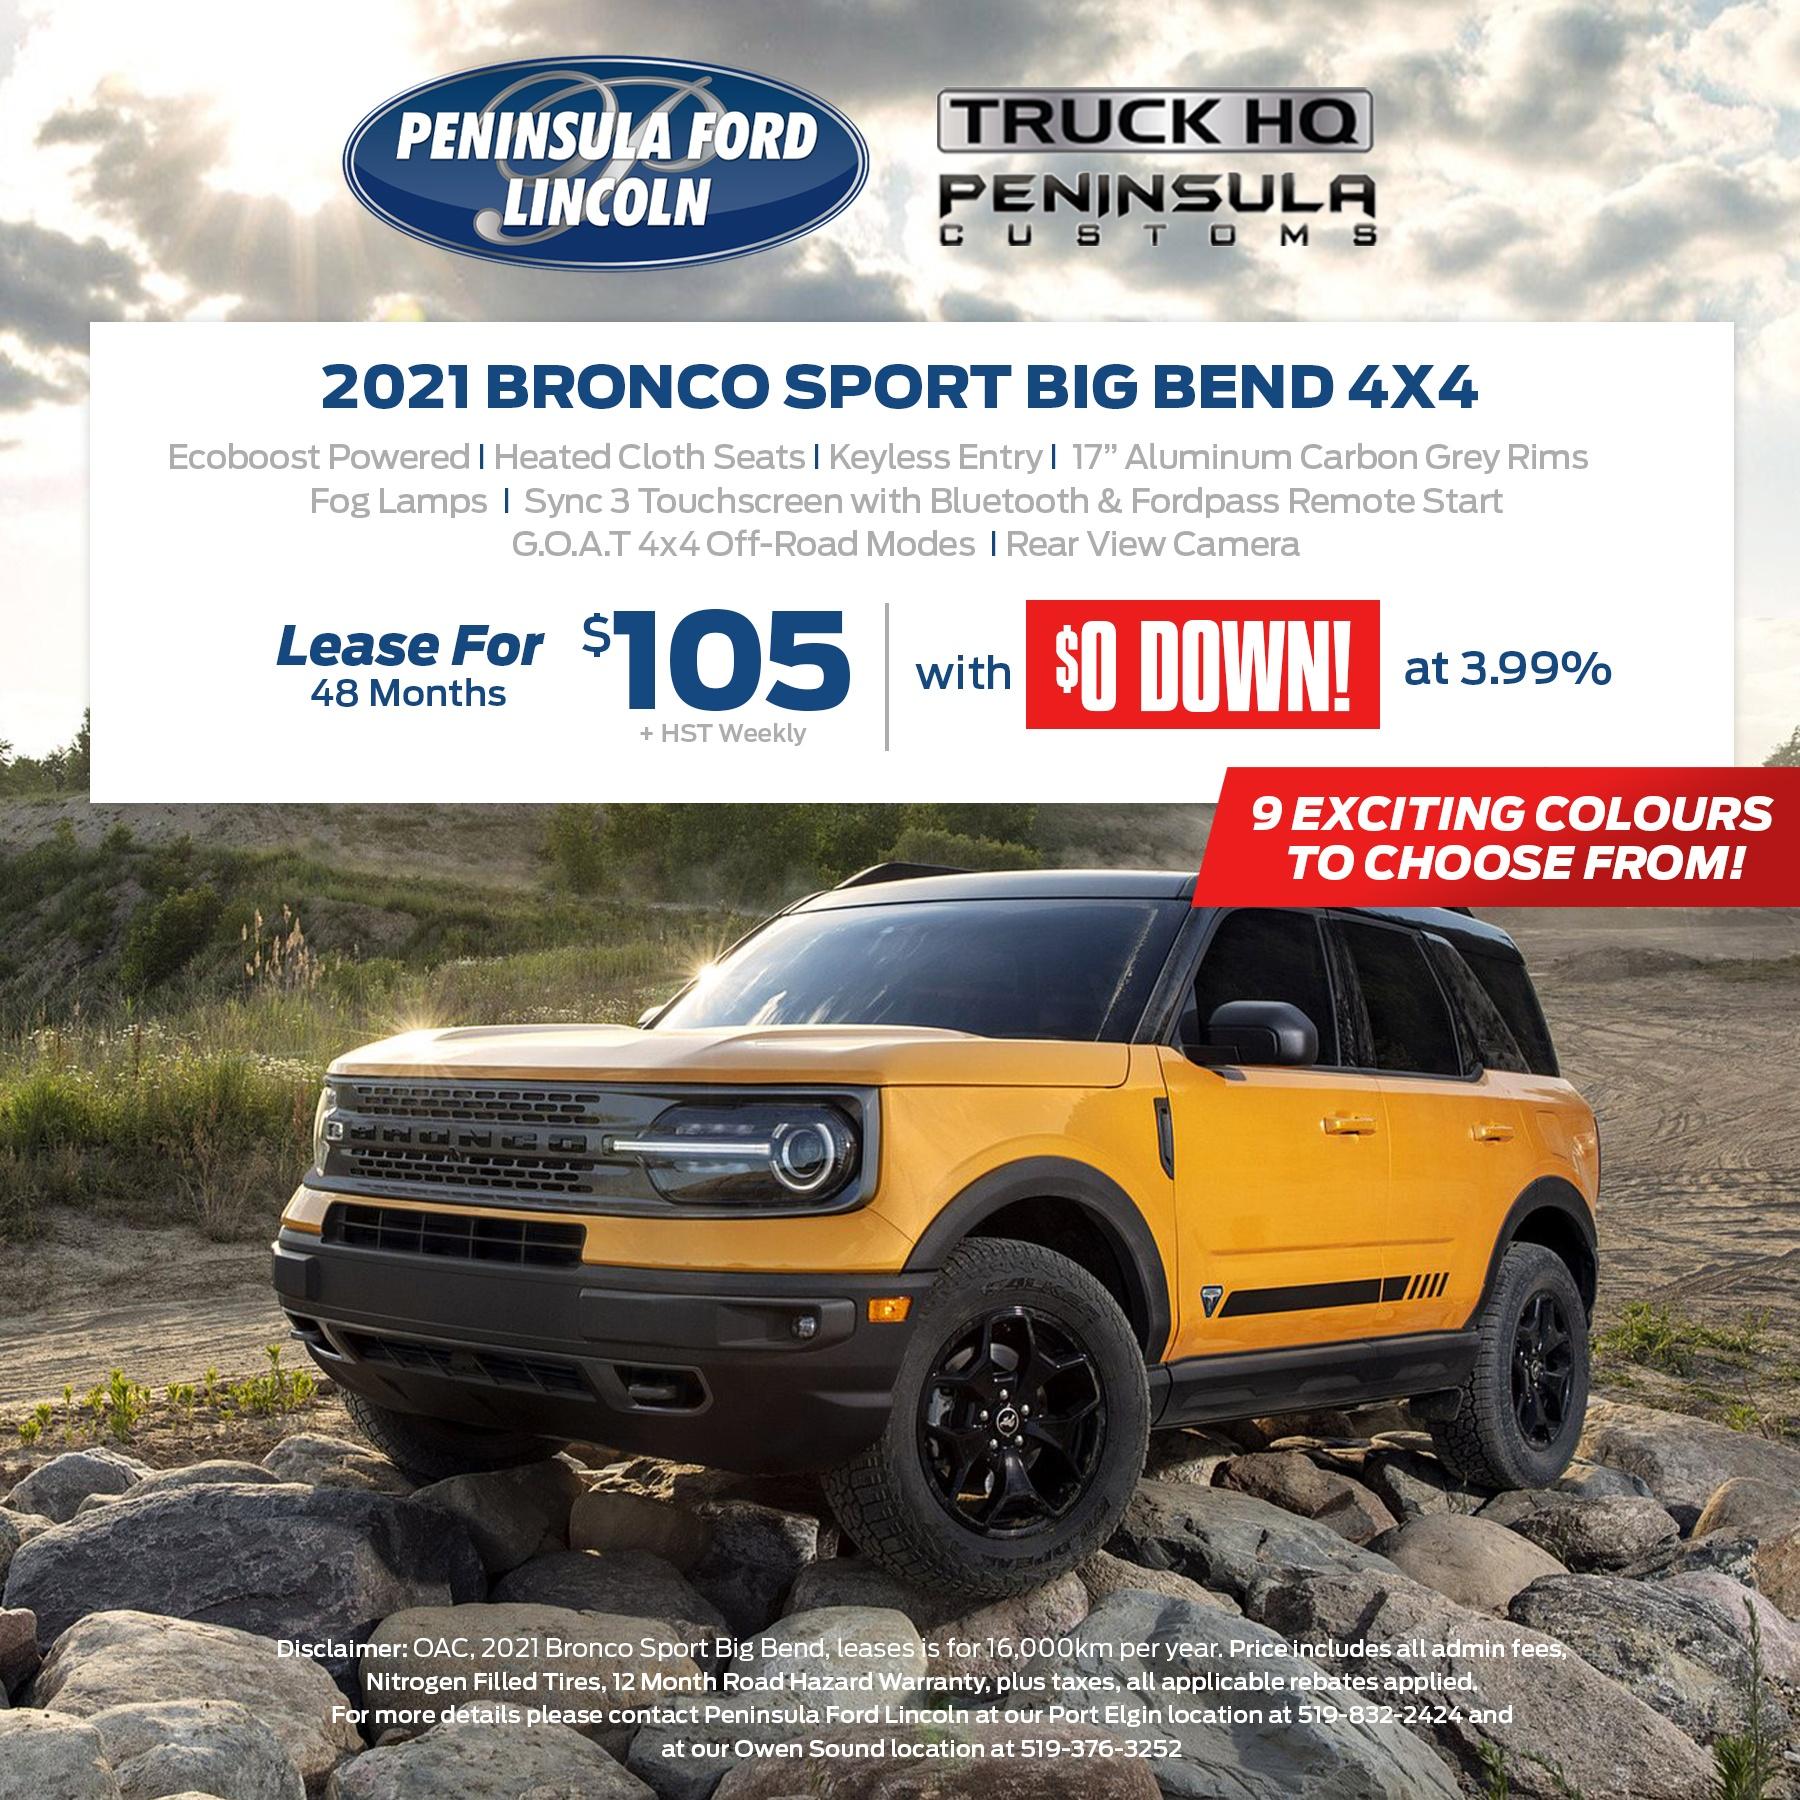 2021 Bronco Sport Big Bend 4×4